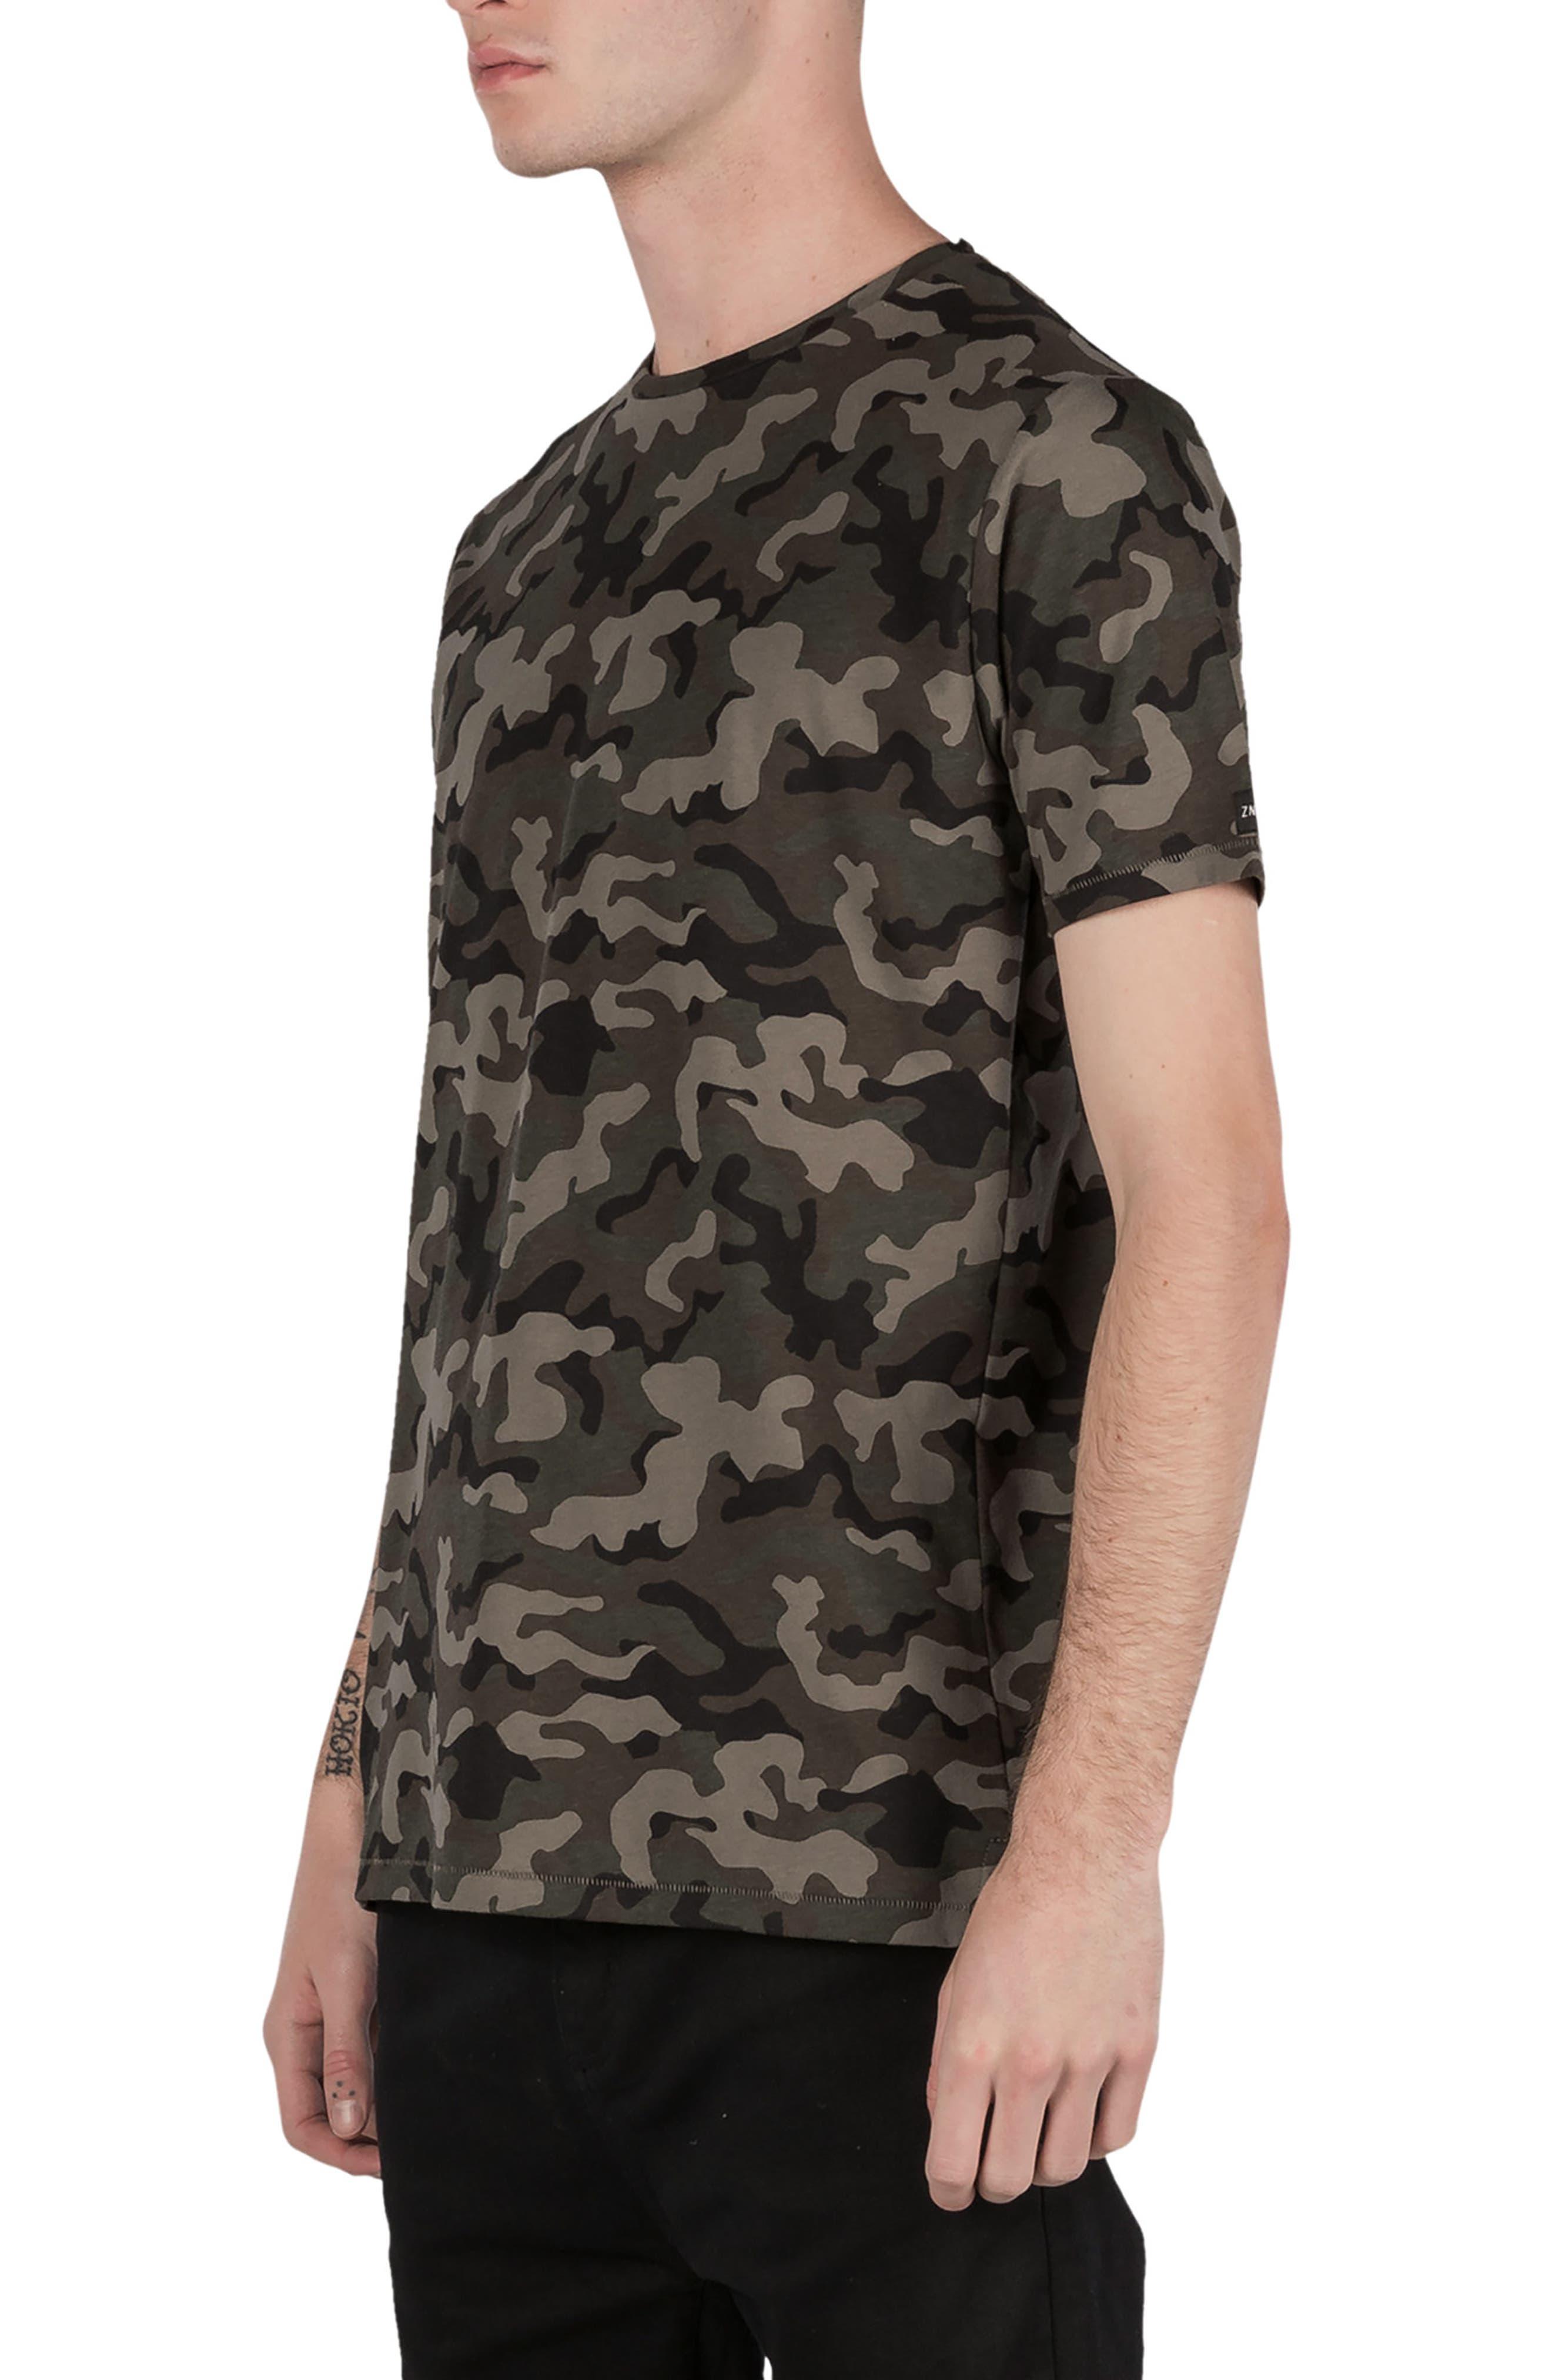 Flintlock Camo T-Shirt,                             Alternate thumbnail 5, color,                             320